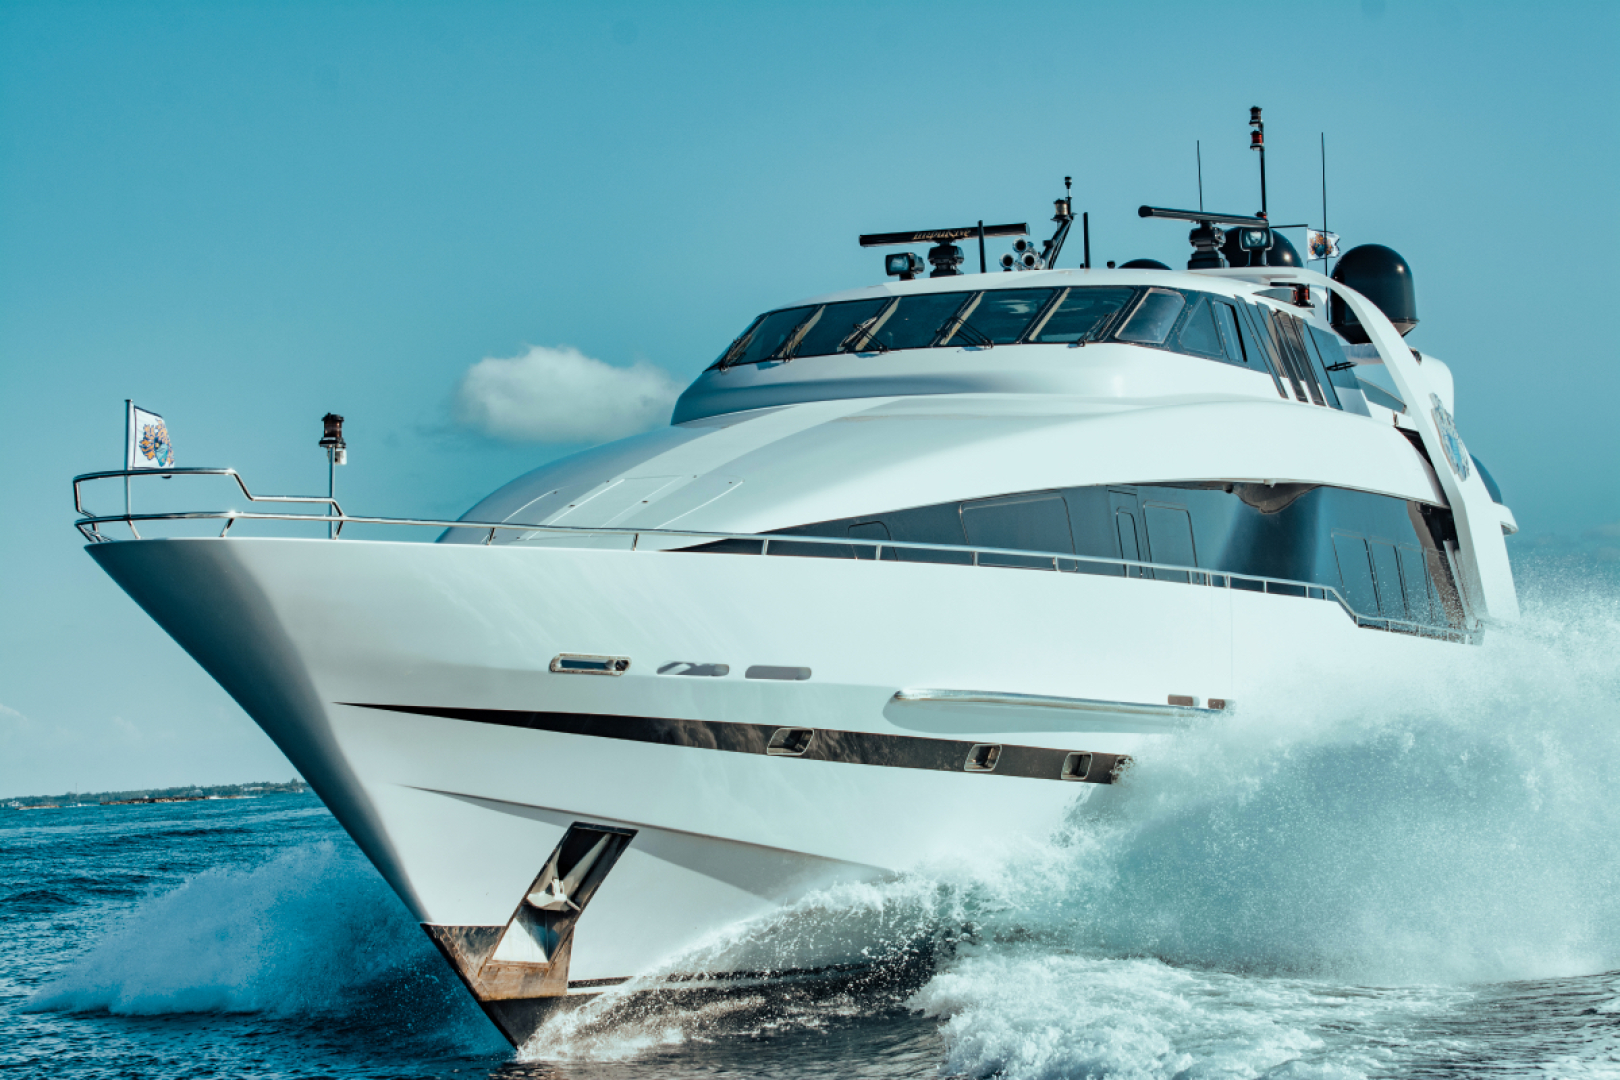 Motor Yacht-Norship 1994-Impulsive Fort Lauderdale-Florida-United States-1562556 | Thumbnail